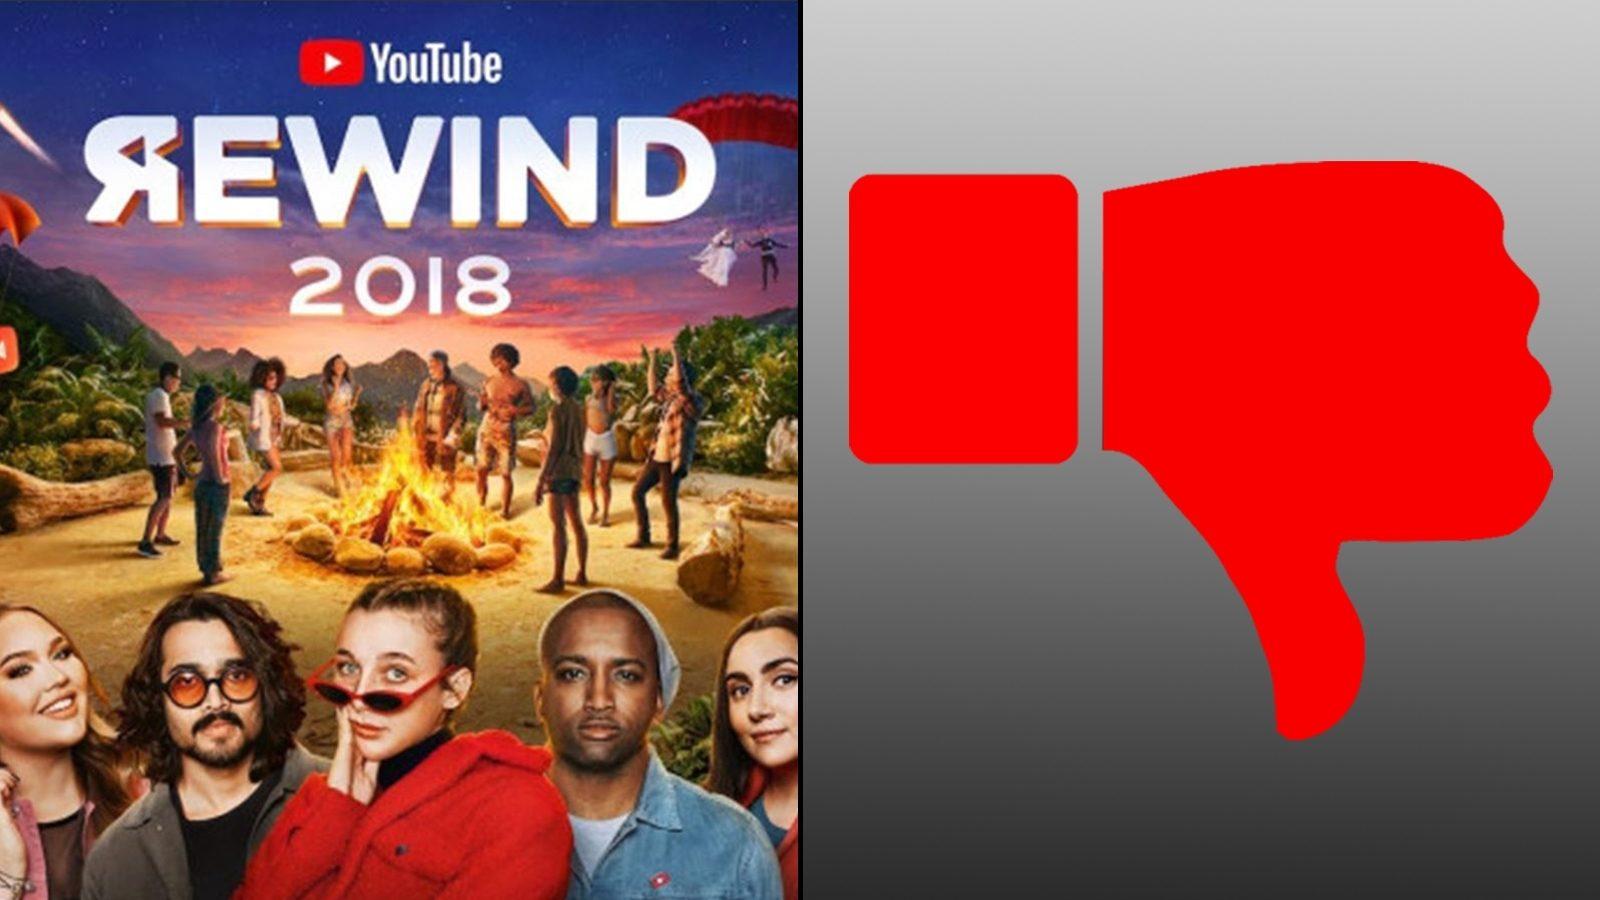 Update Youtube Rewind 2018 Video On Course To Break Dislike Record Dexerto